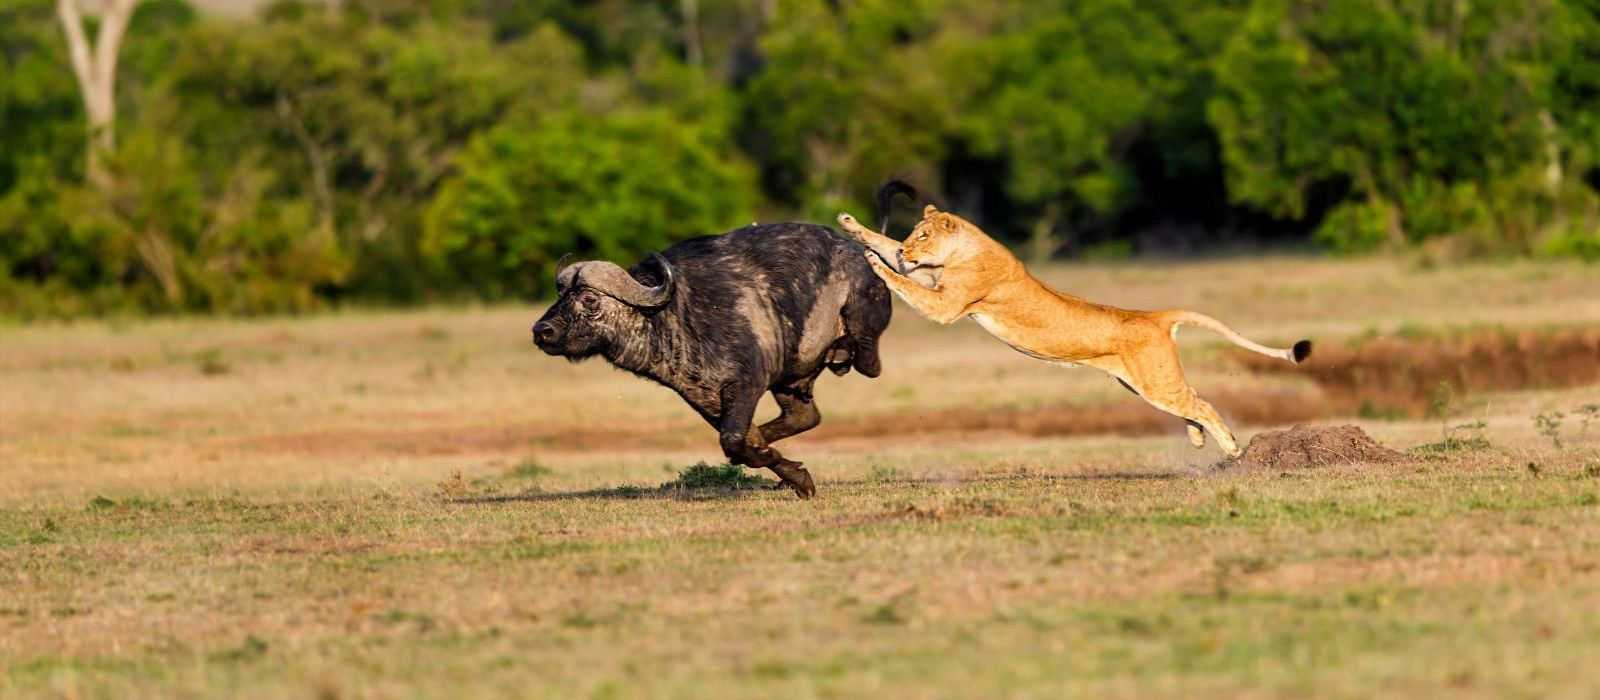 Kenia: Masai Mara, Wandersafaris & Traumstrände Urlaub 3